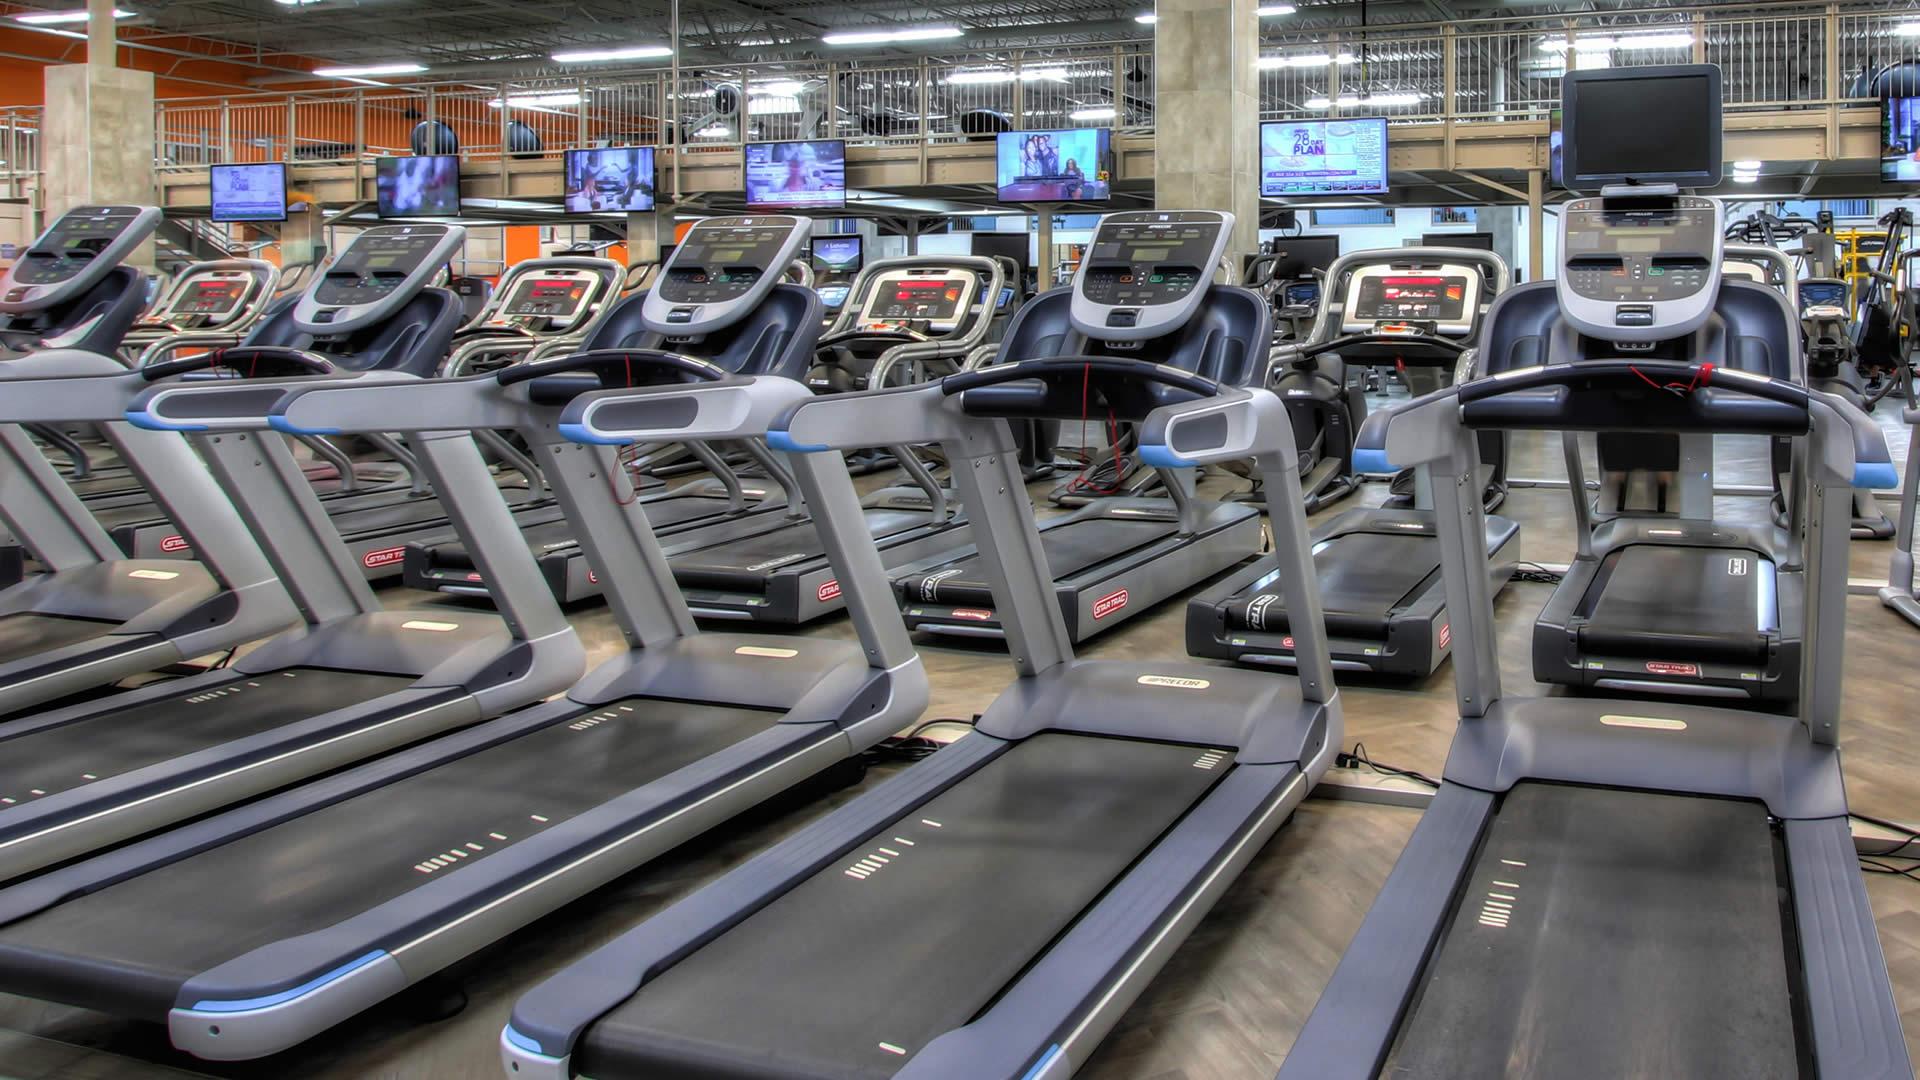 VA Beach Blvd Gym